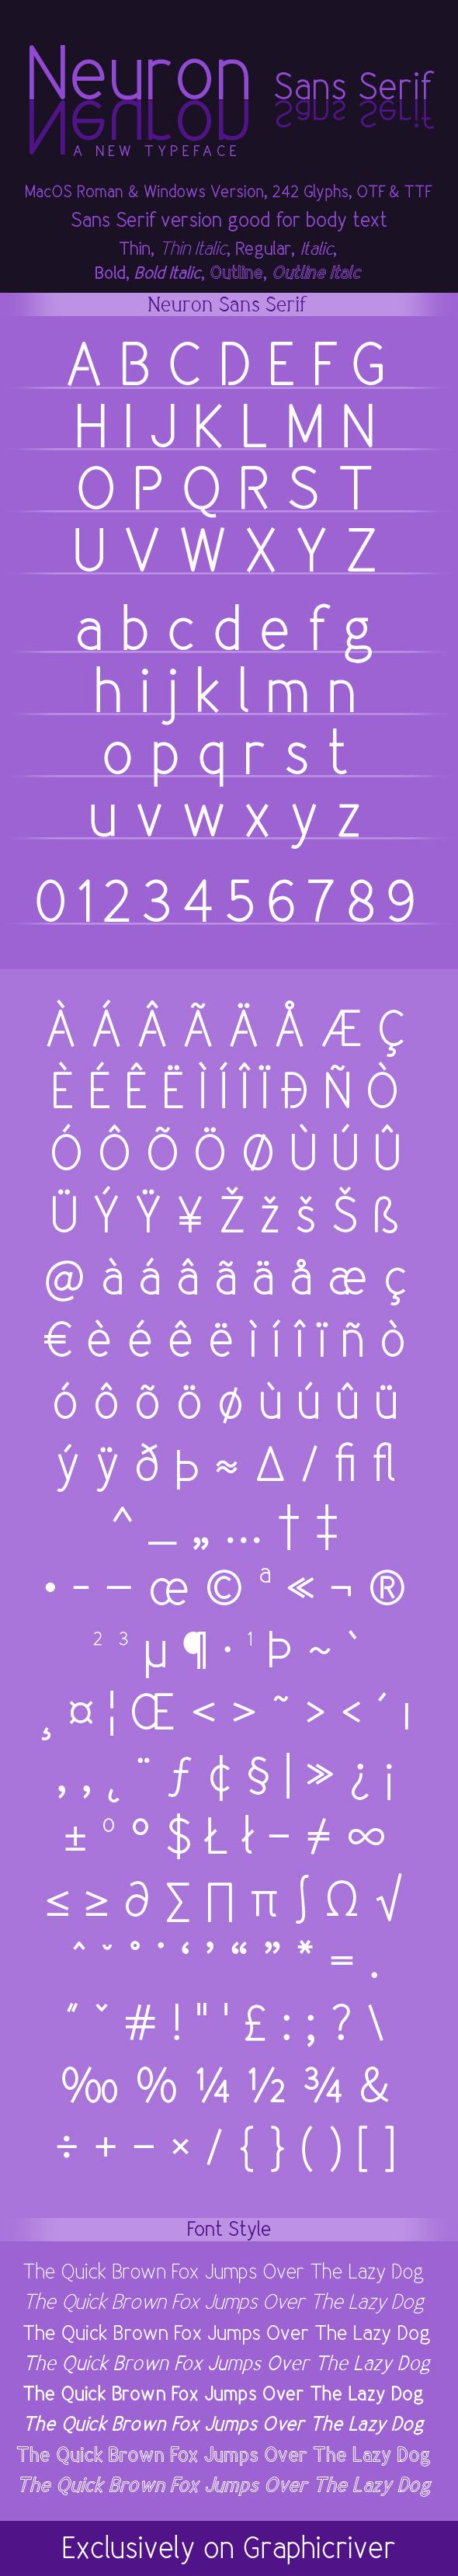 GraphicRiver Neuron Sans-Serif Family 11207044